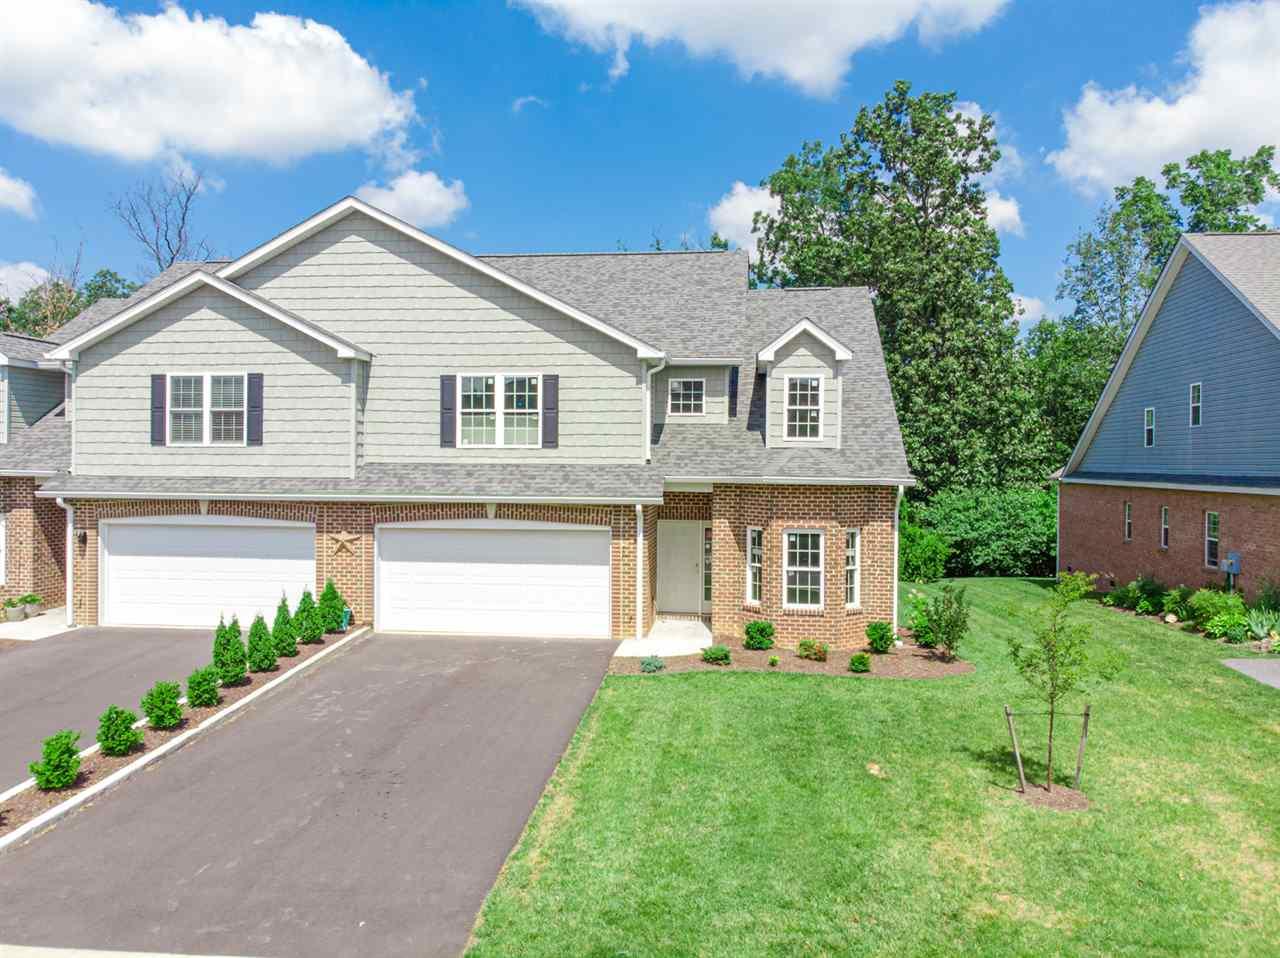 218  Forest Ridge Rd,  Staunton, VA